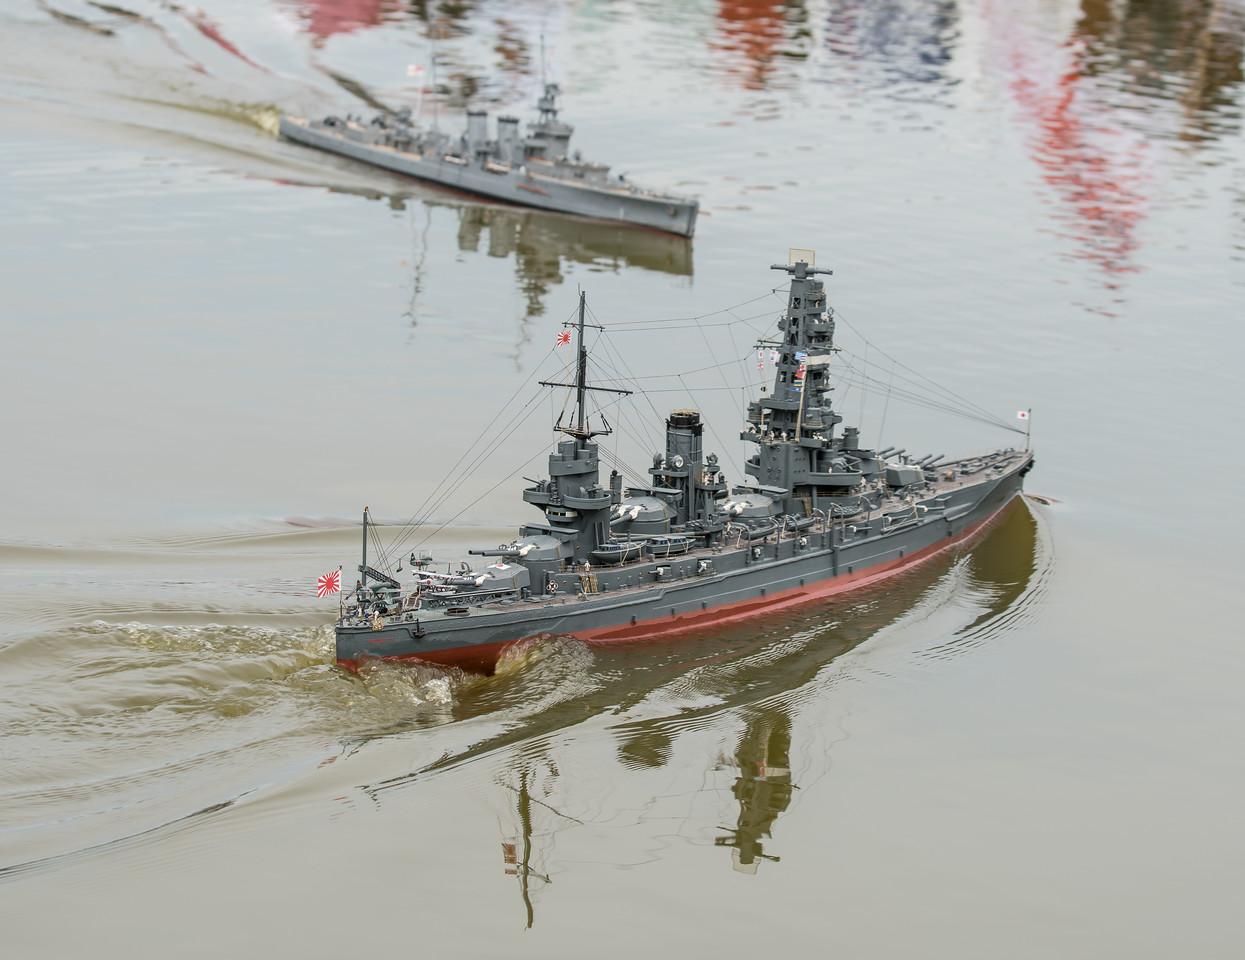 C-class light cruiser, David McNair-Taylor, HMS Curacoa, IJN Yamashiro, Japanese Fusō-class battleship, Navy Day 2017, SRCMBC, Setley Pond, Solent Radio Control Model Boat Club, Thanasis Kanias